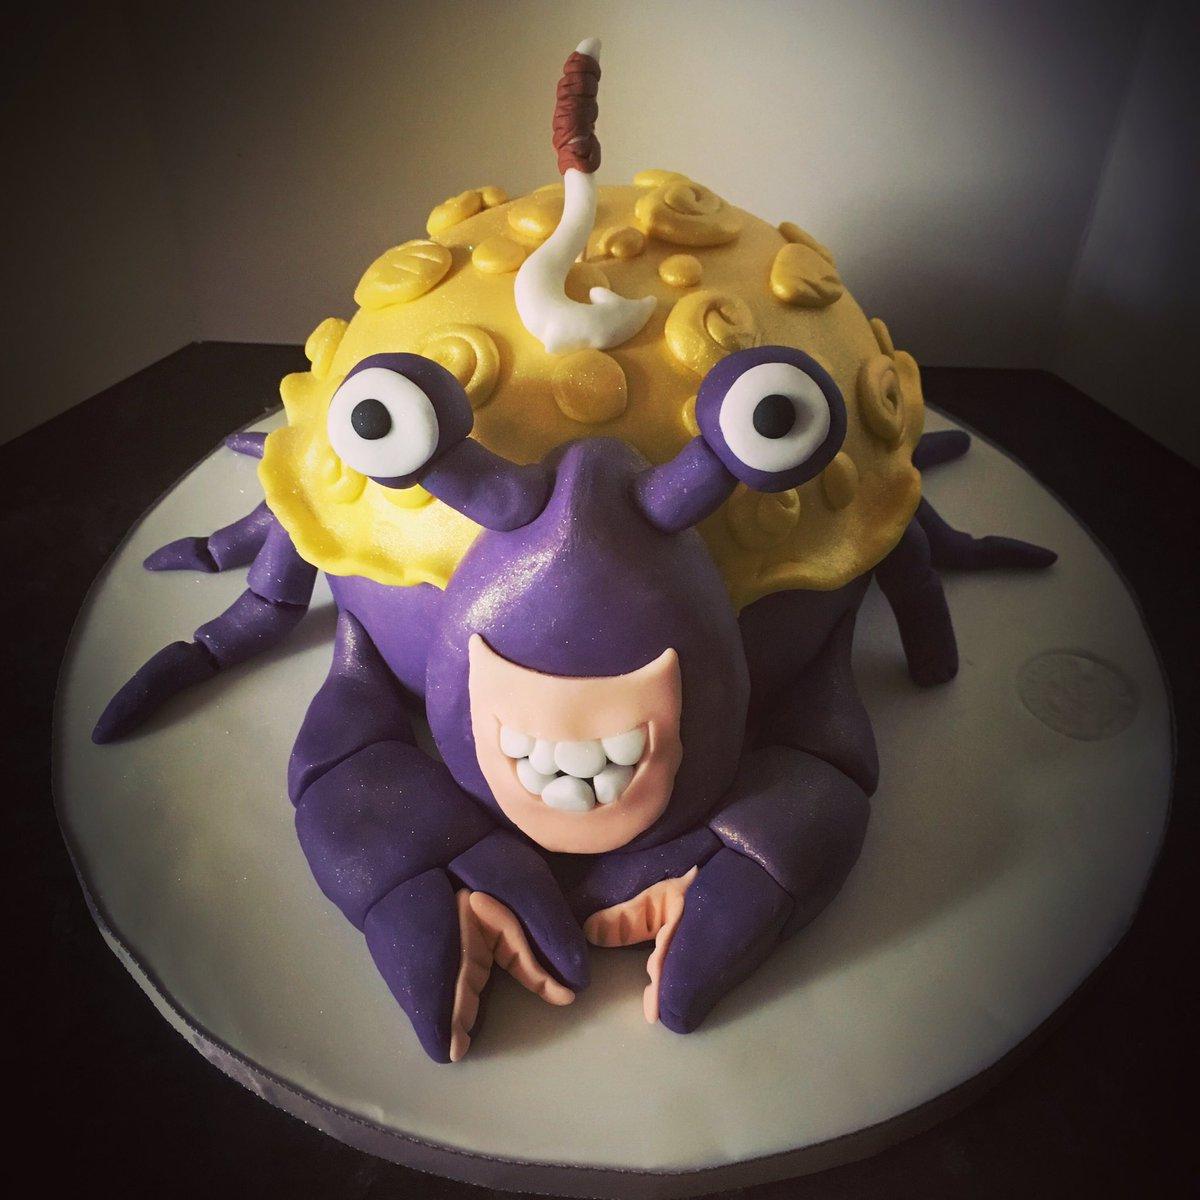 Sunflower Cakes On Twitter Tamatoa ShinyCrab Moana MoanaCake Maui Simply Loved Making This Hes So Shiny